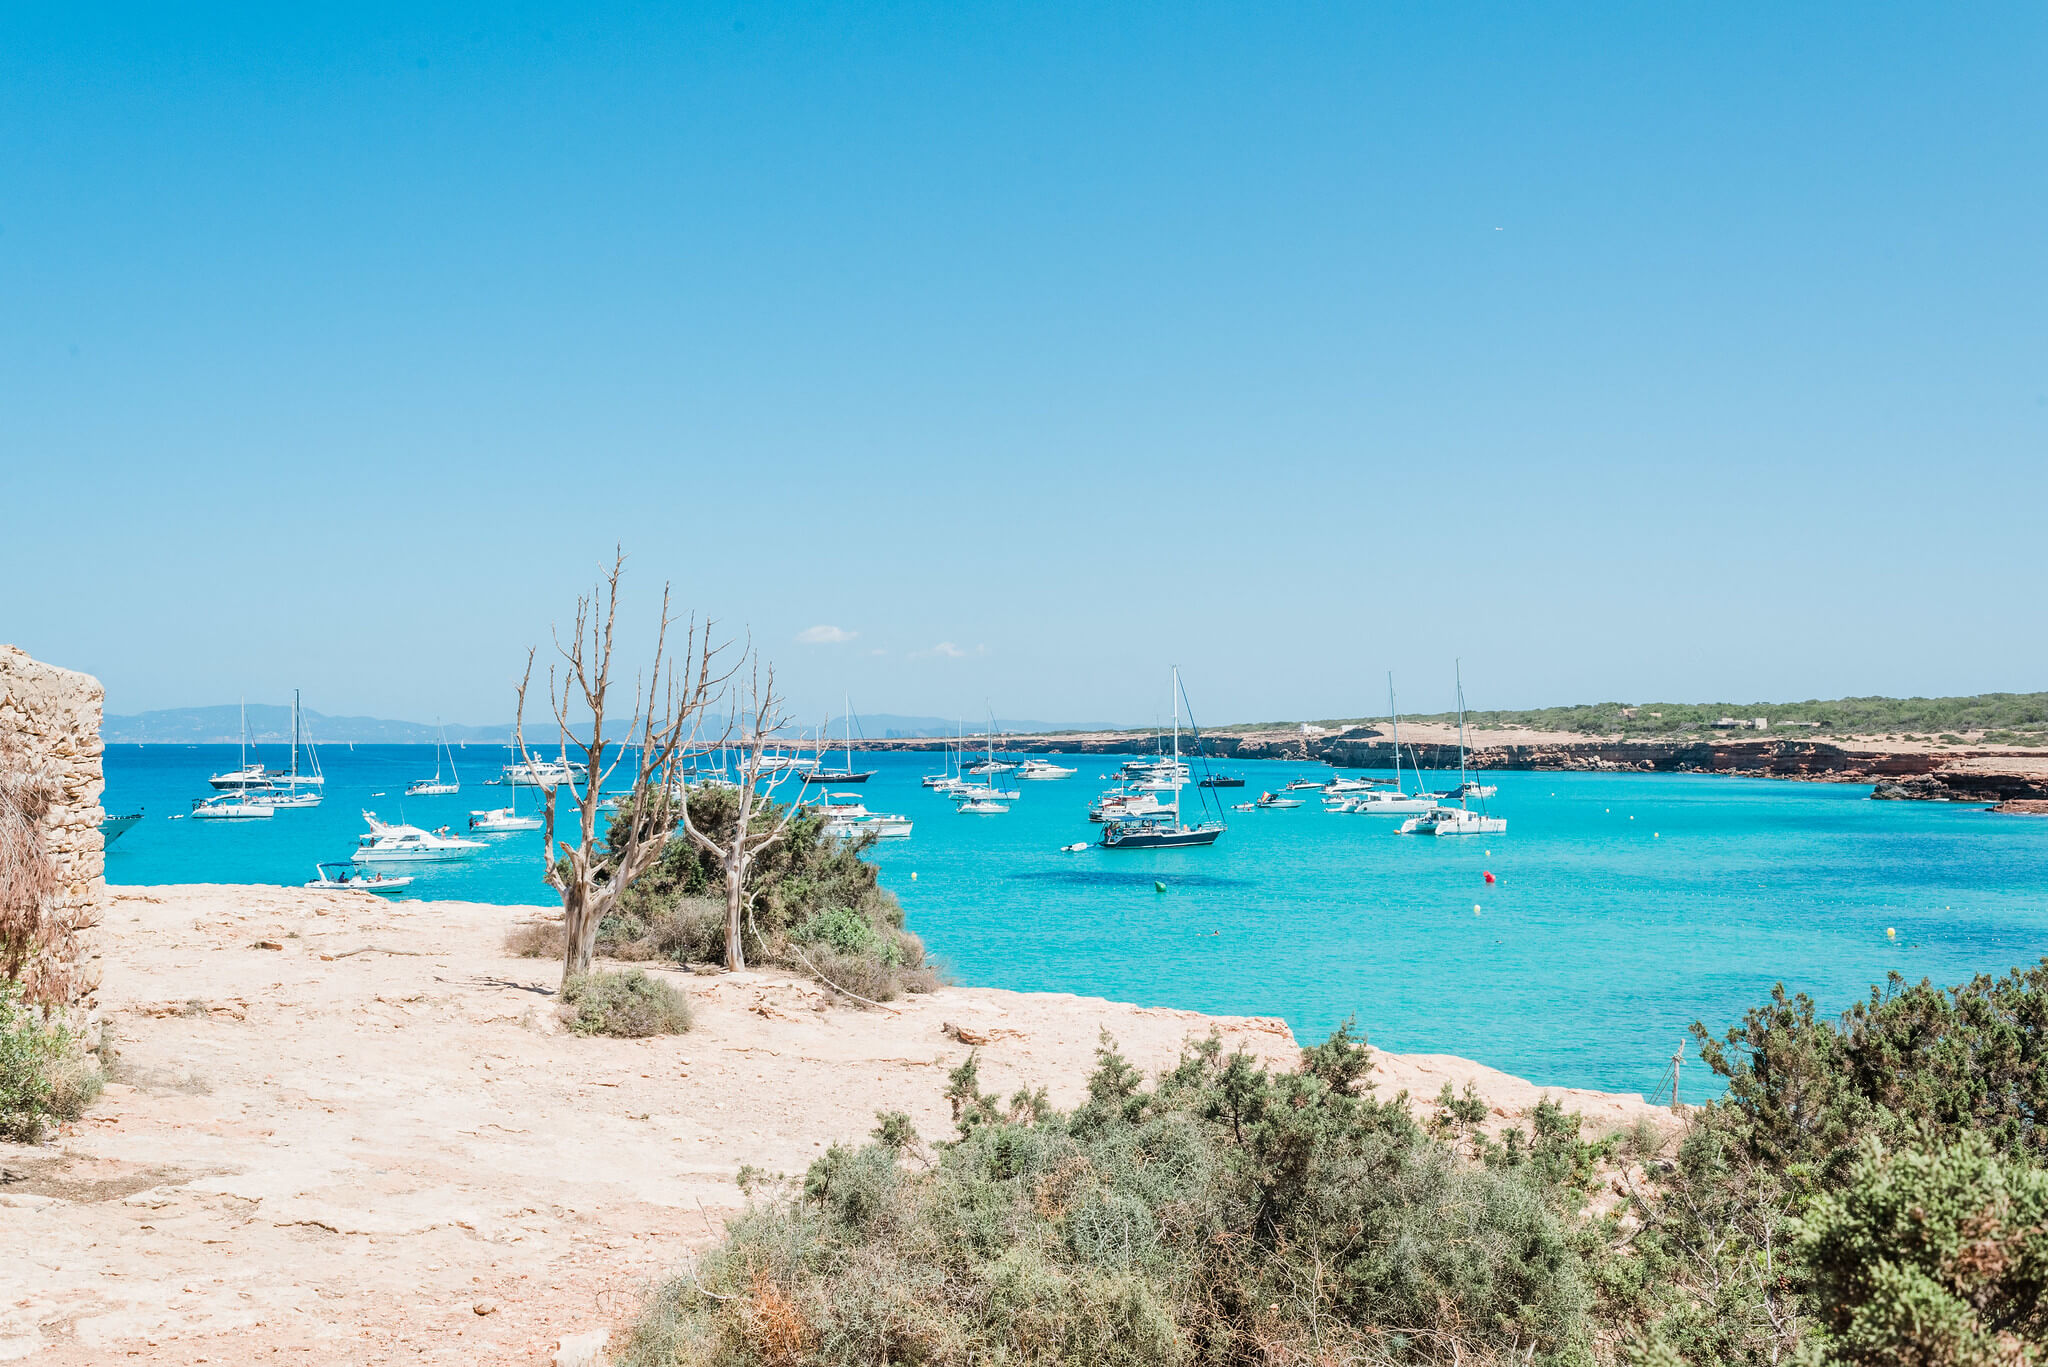 https://www.white-ibiza.com/wp-content/uploads/2020/03/formentera-beaches-cala-saona-2020-08.jpg